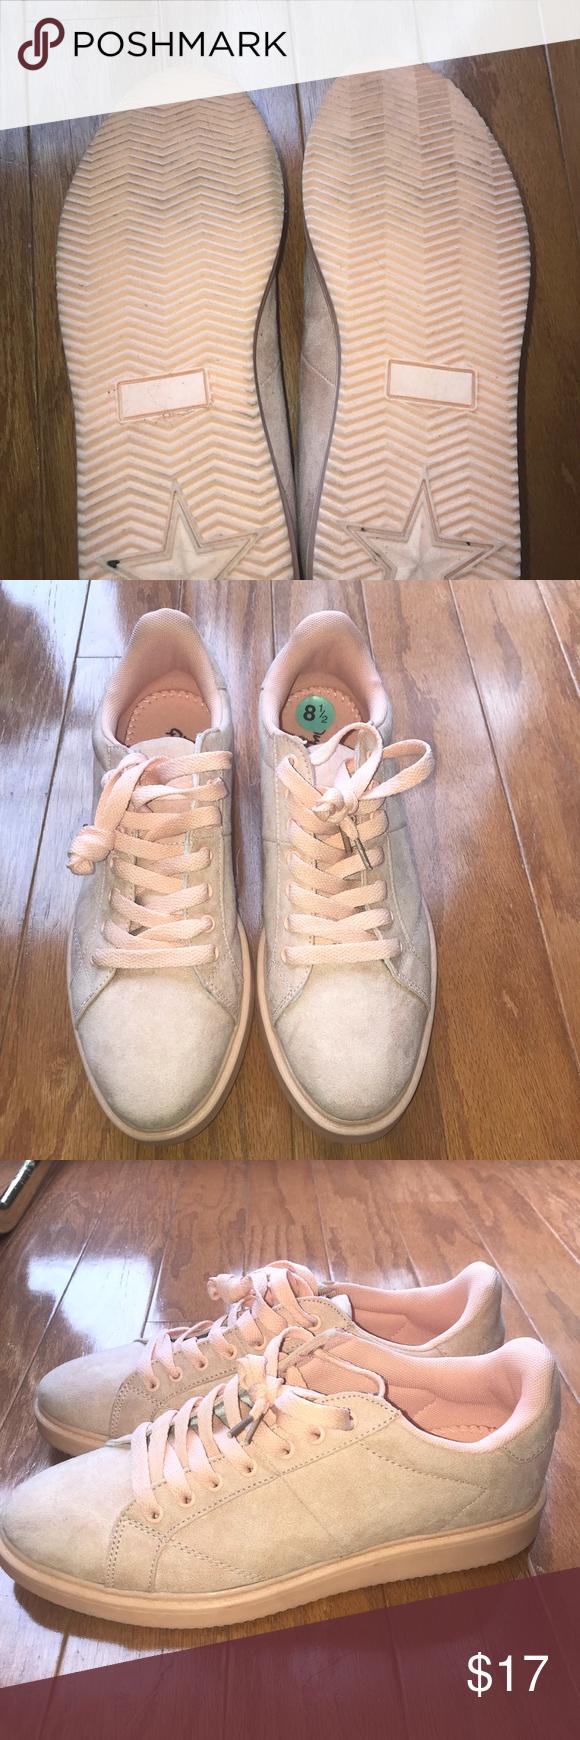 Women's sneakers size 8.5 Bought at Burlington coat